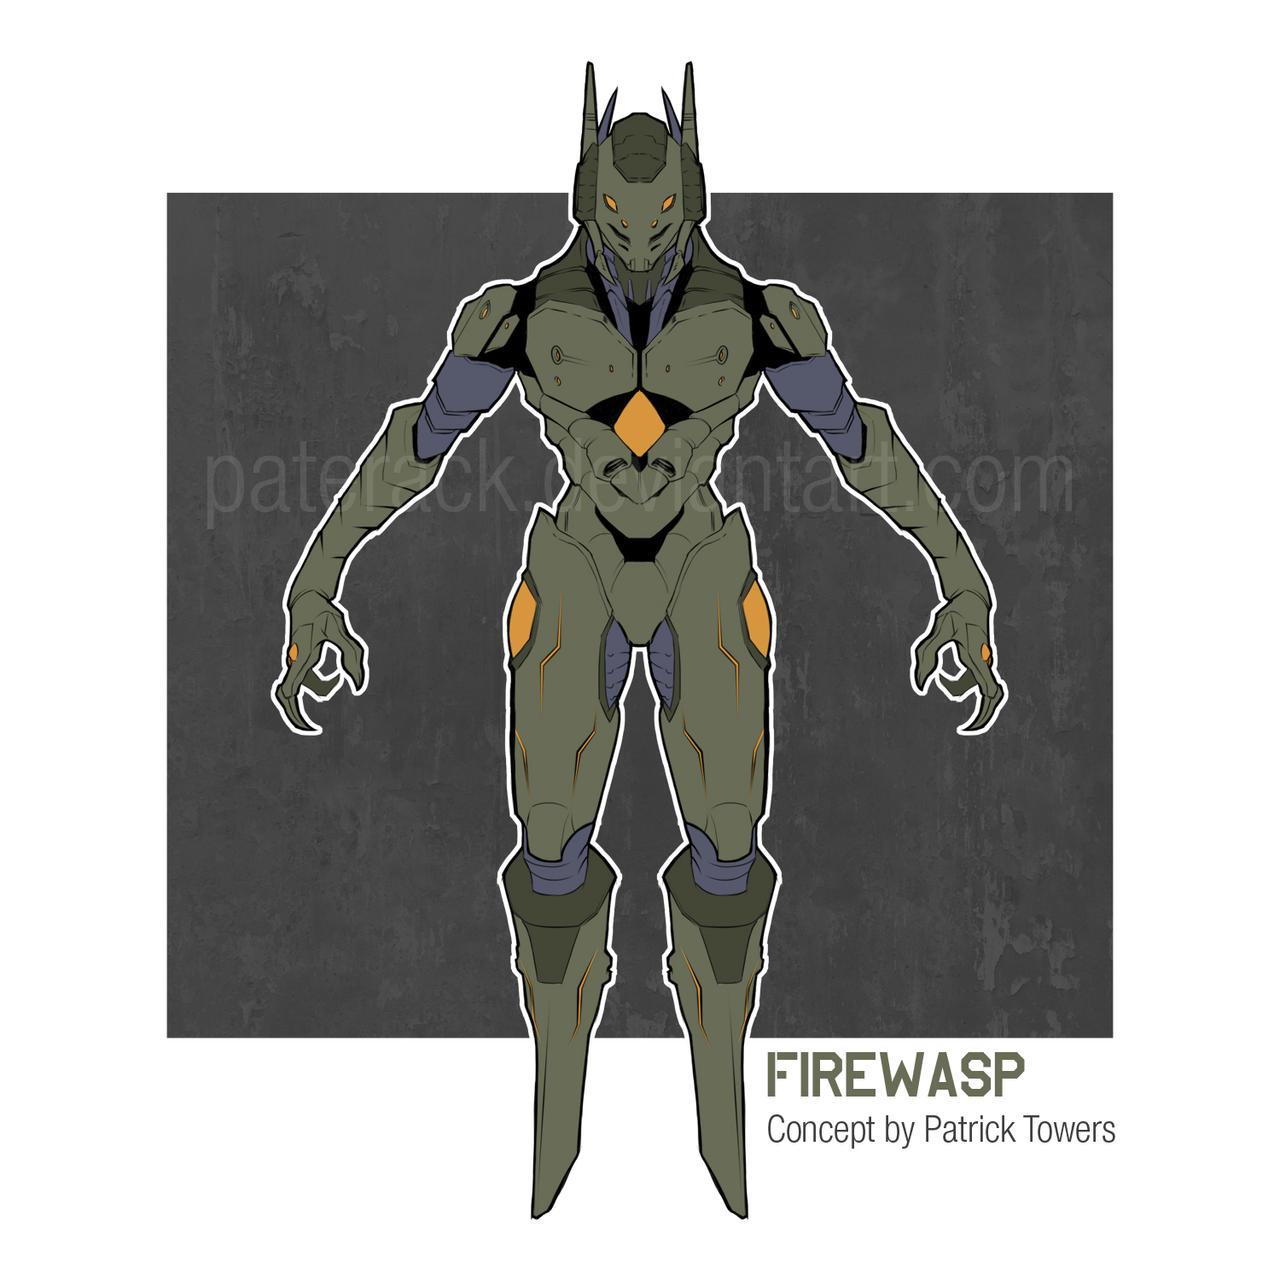 Firewasp Reborn by Paterack